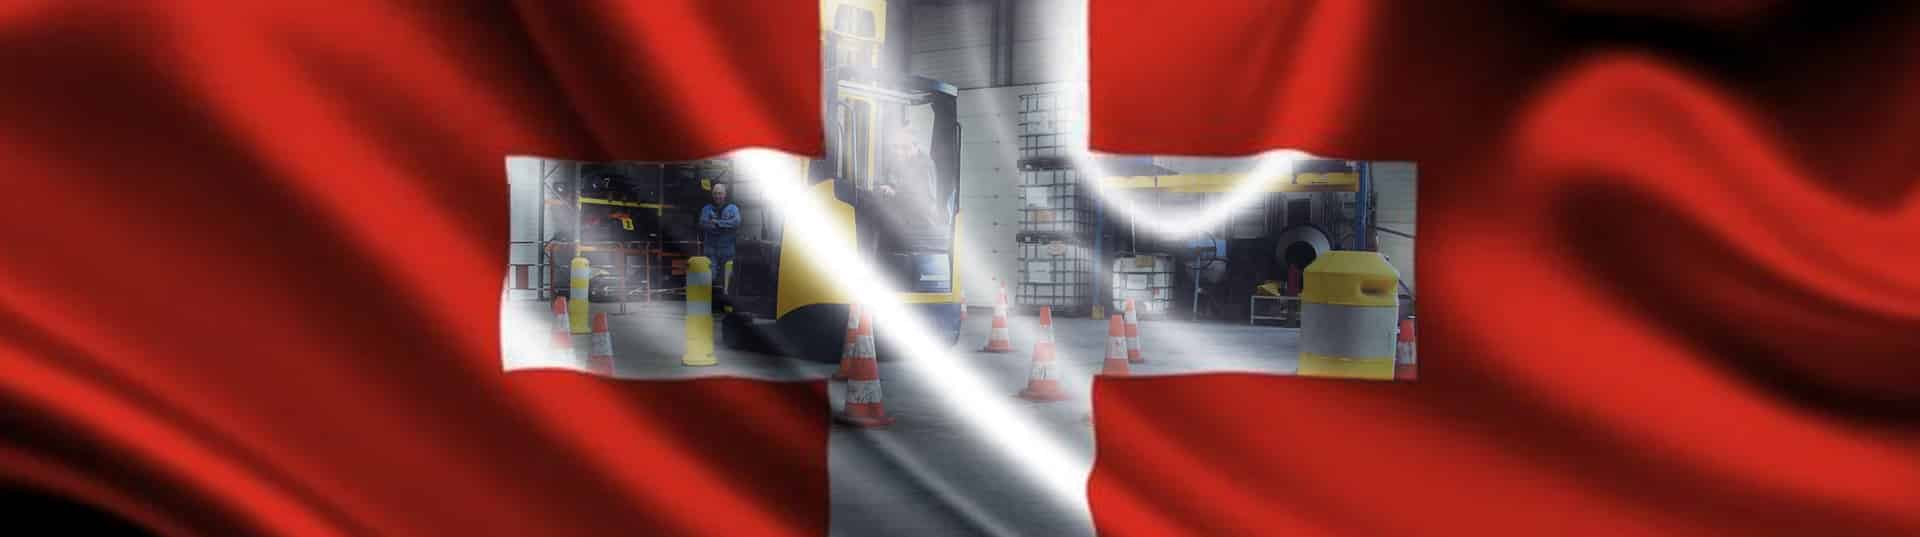 Conversion Permis Cariste Suisse